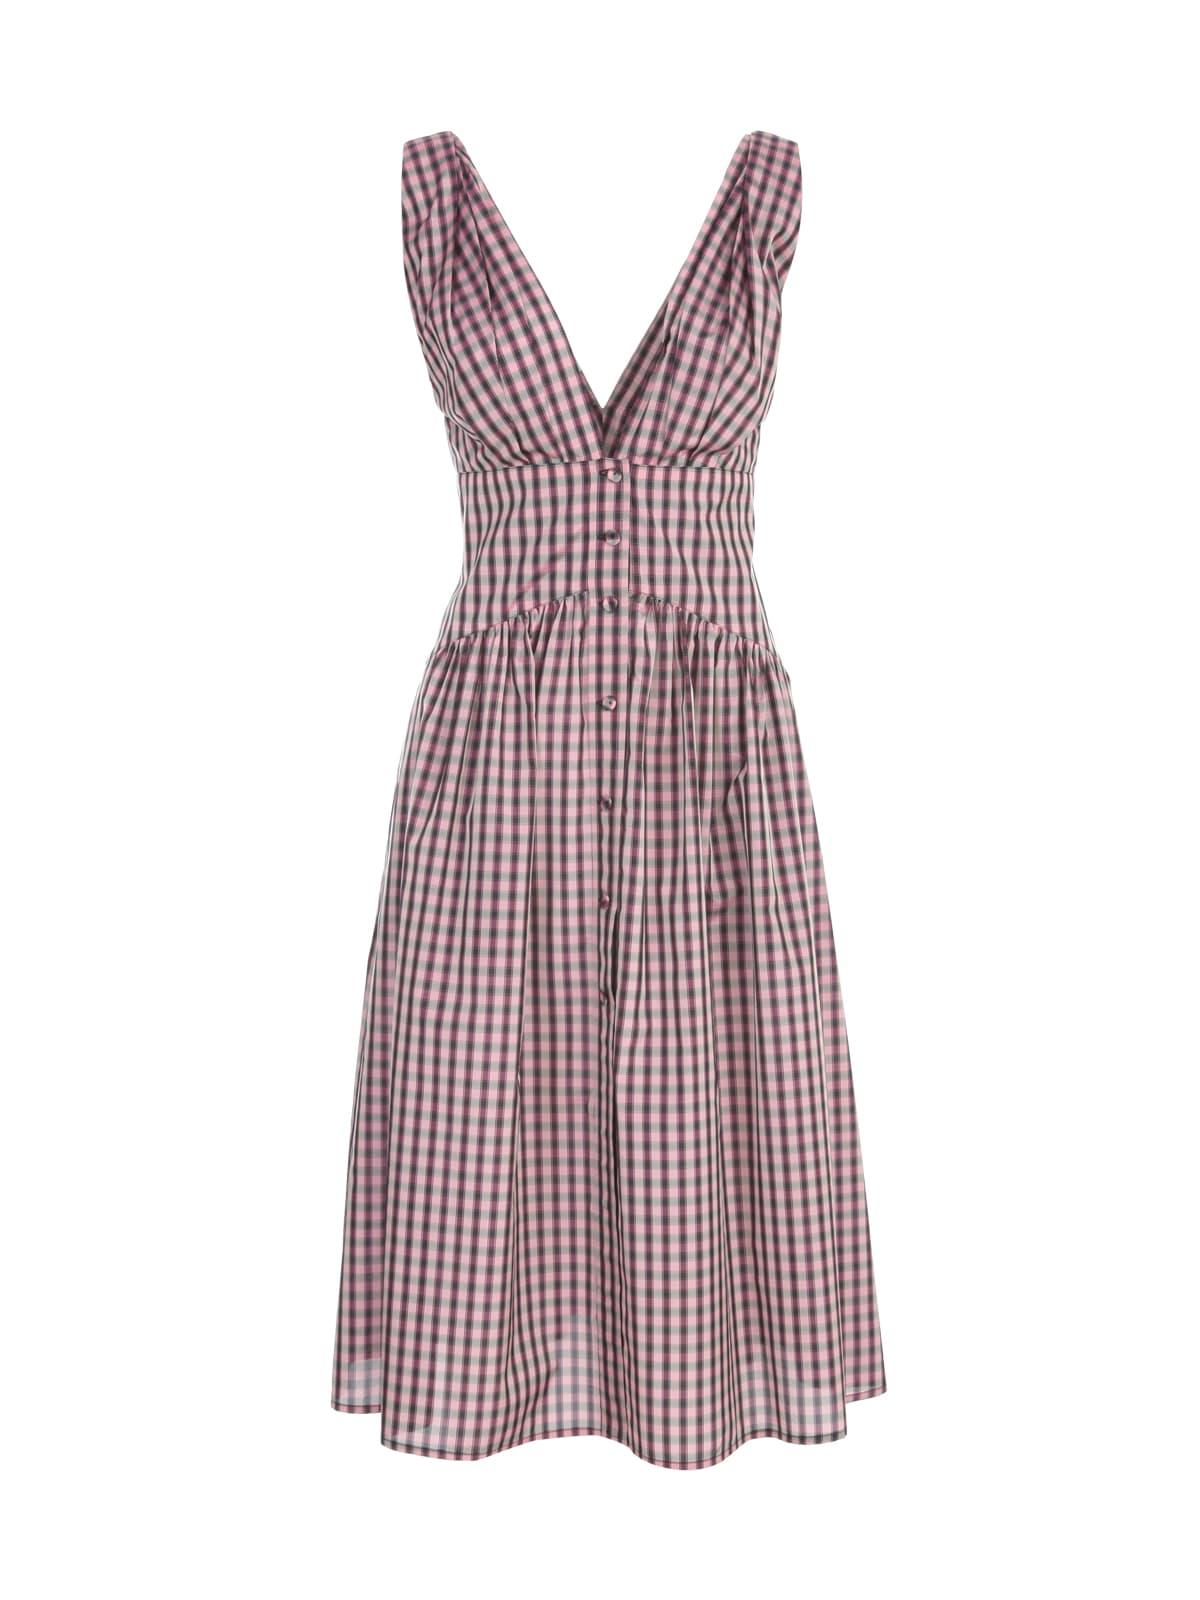 Buy Philosophy di Lorenzo Serafini Vichy Longuette V Neck Sleeveless Dress online, shop Philosophy di Lorenzo Serafini with free shipping